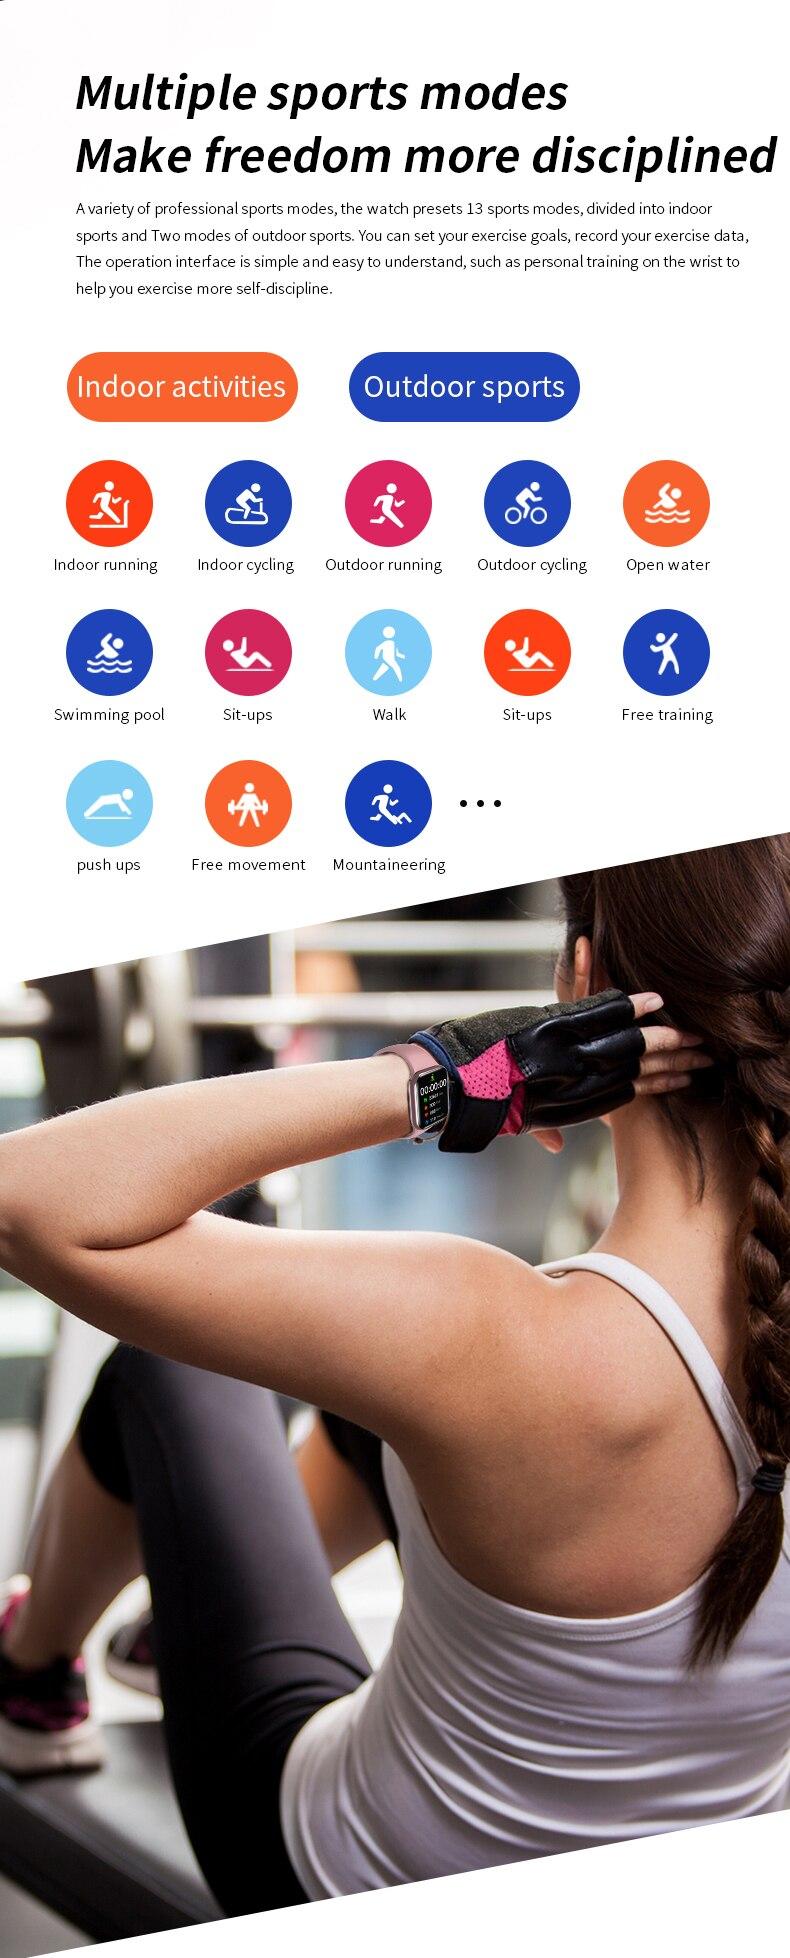 Hf6a690ae37d64aa9ab43cfa1062e7014t Original HW16 44mm Smart Watch Series6 Men 320*385 Screen Custom Picture Smartwatch Women BluetoothCall 2021 pk FK88 IWO13 W46